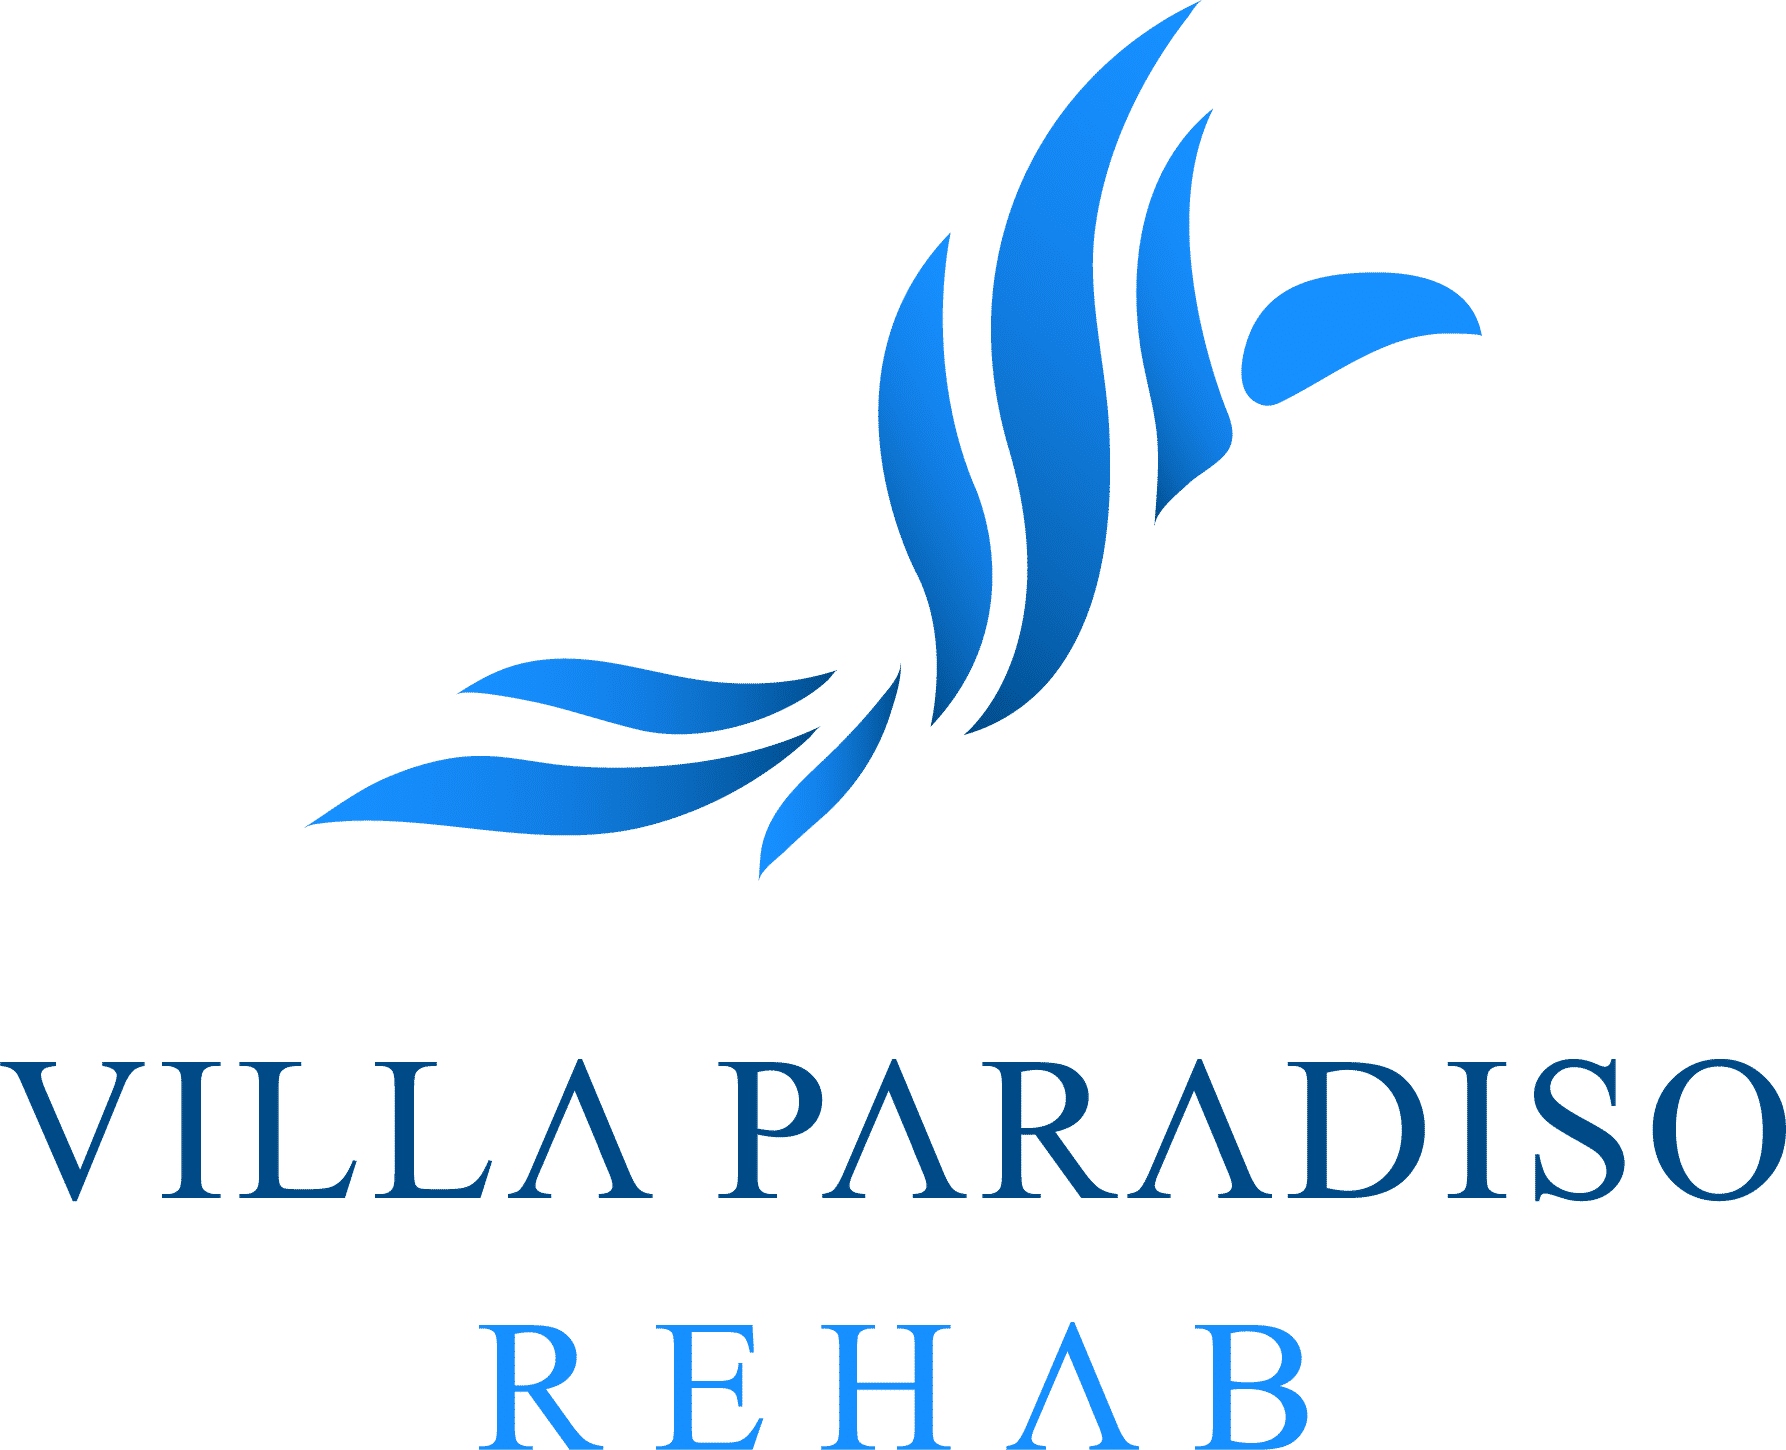 logo villa paradiso spain marbella